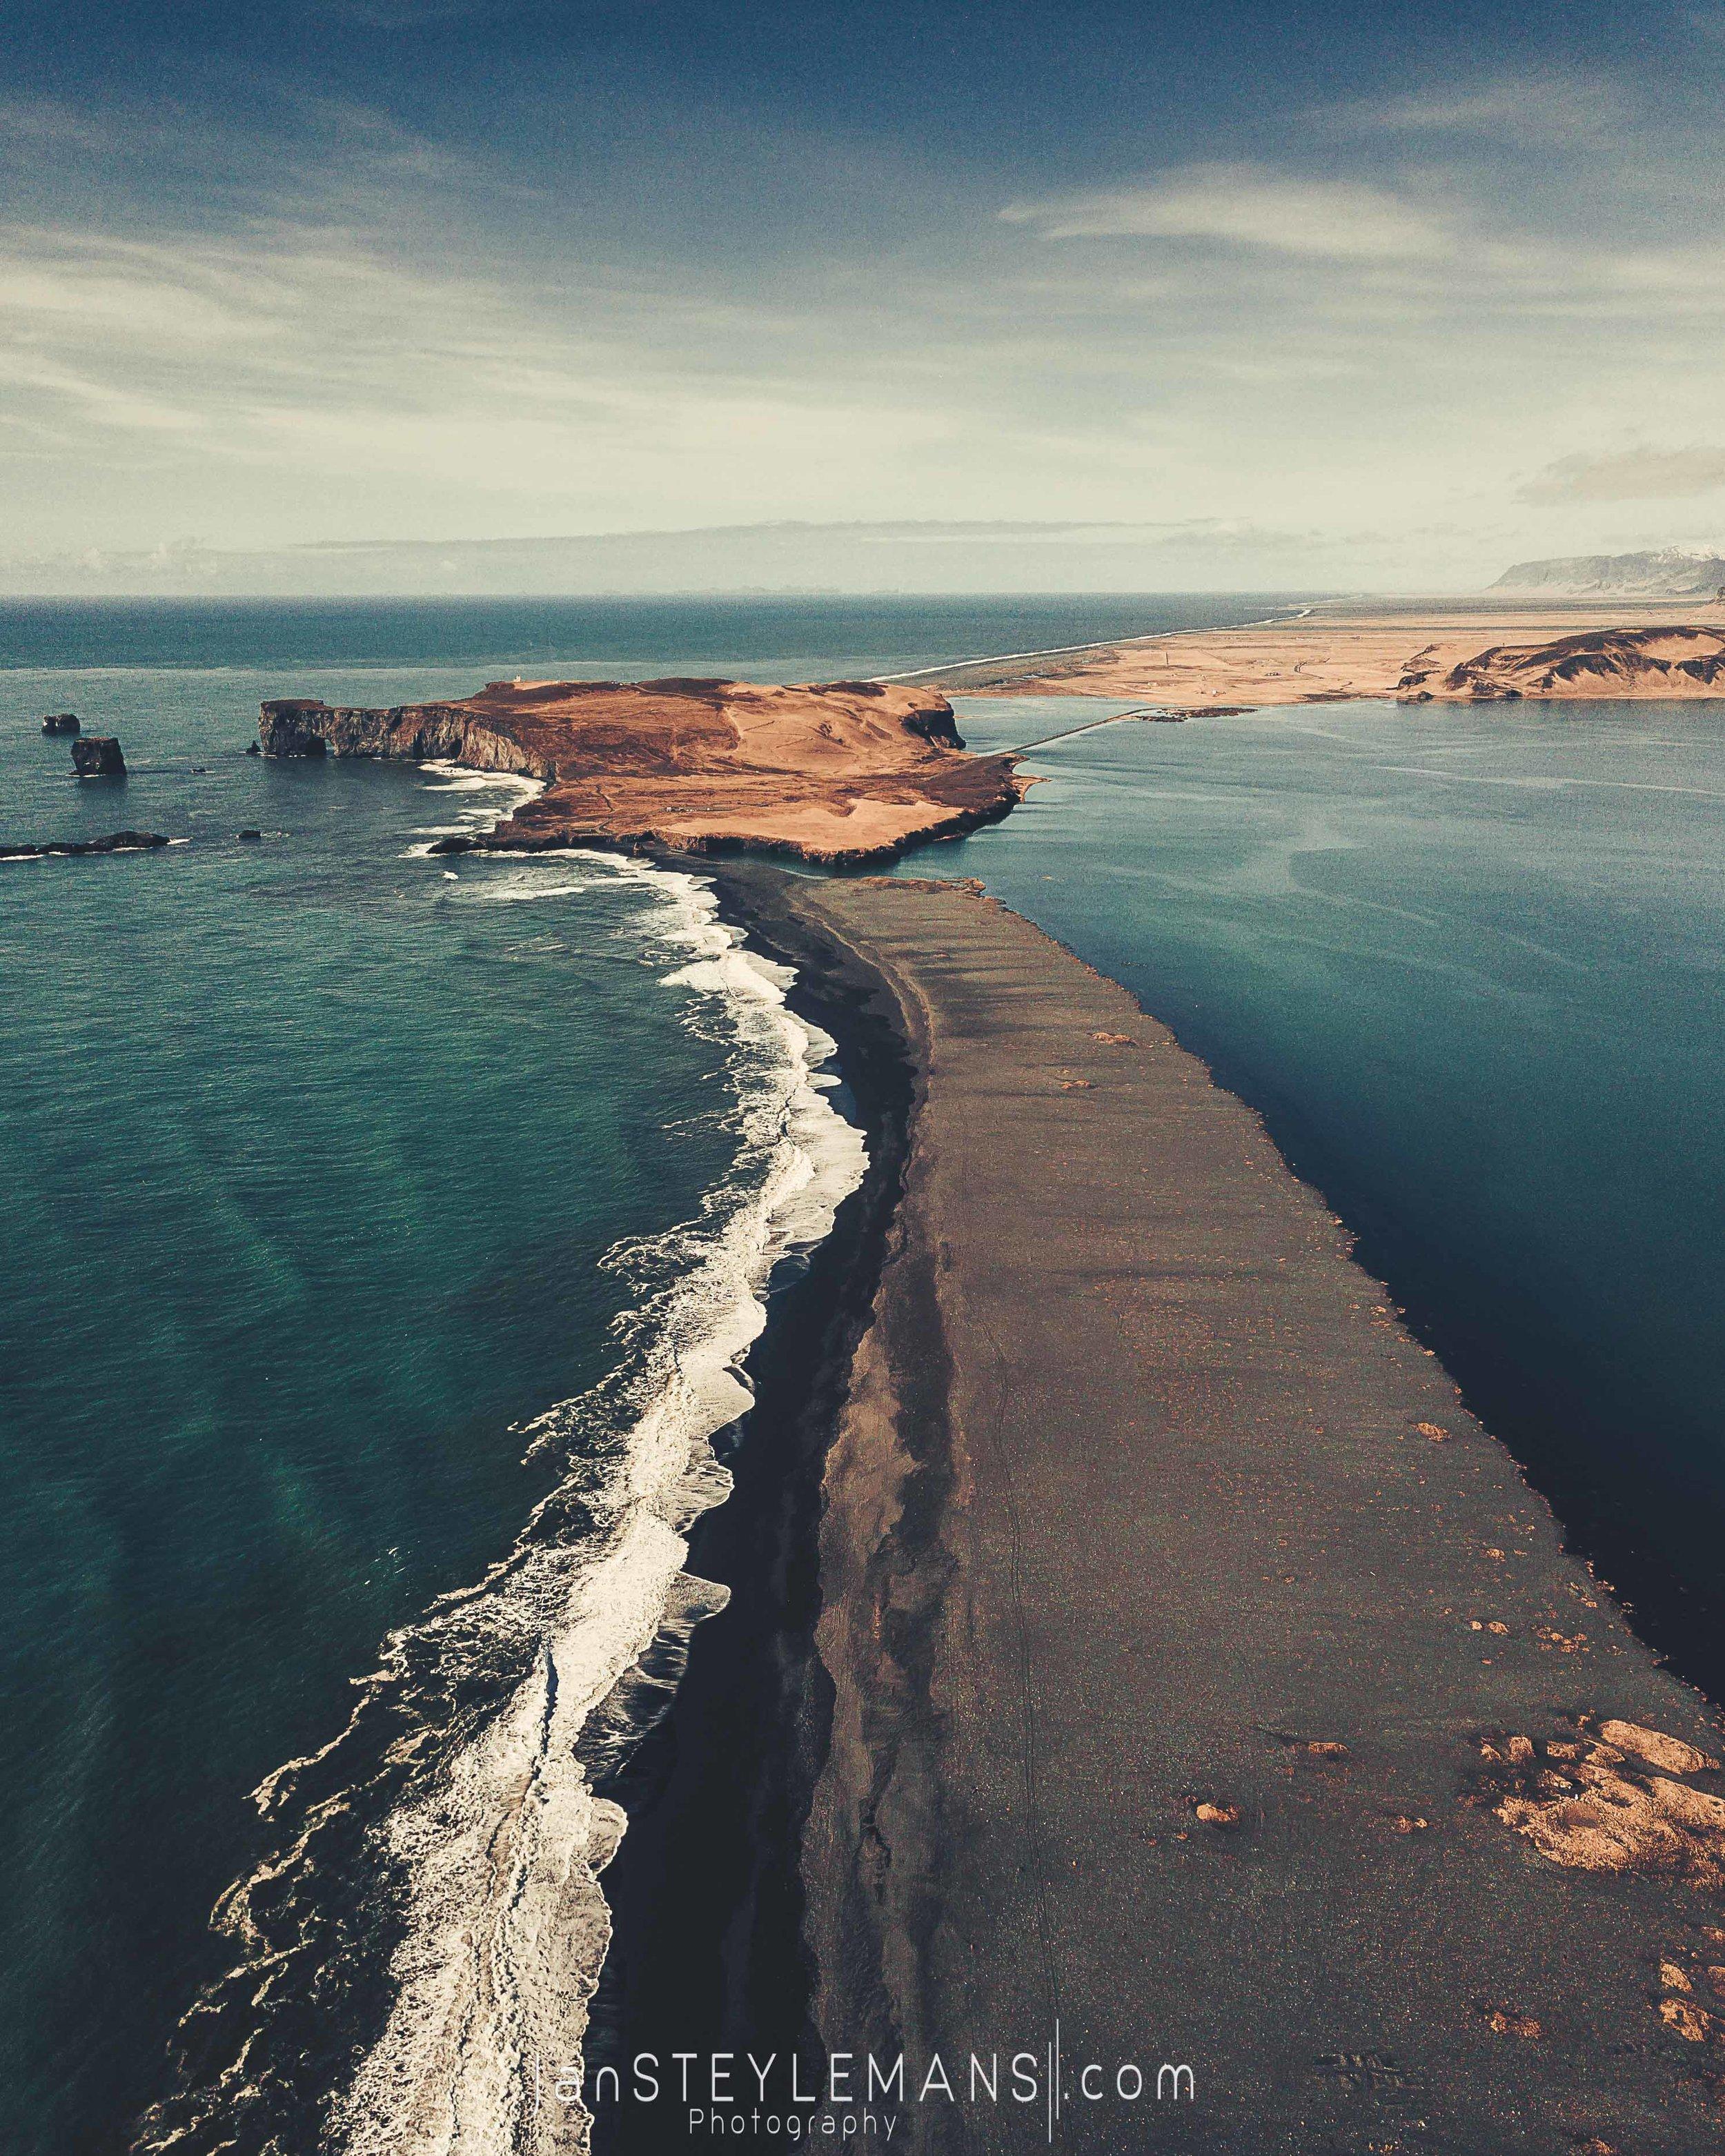 60. Rejnisfjara, Iceland. (aerial)